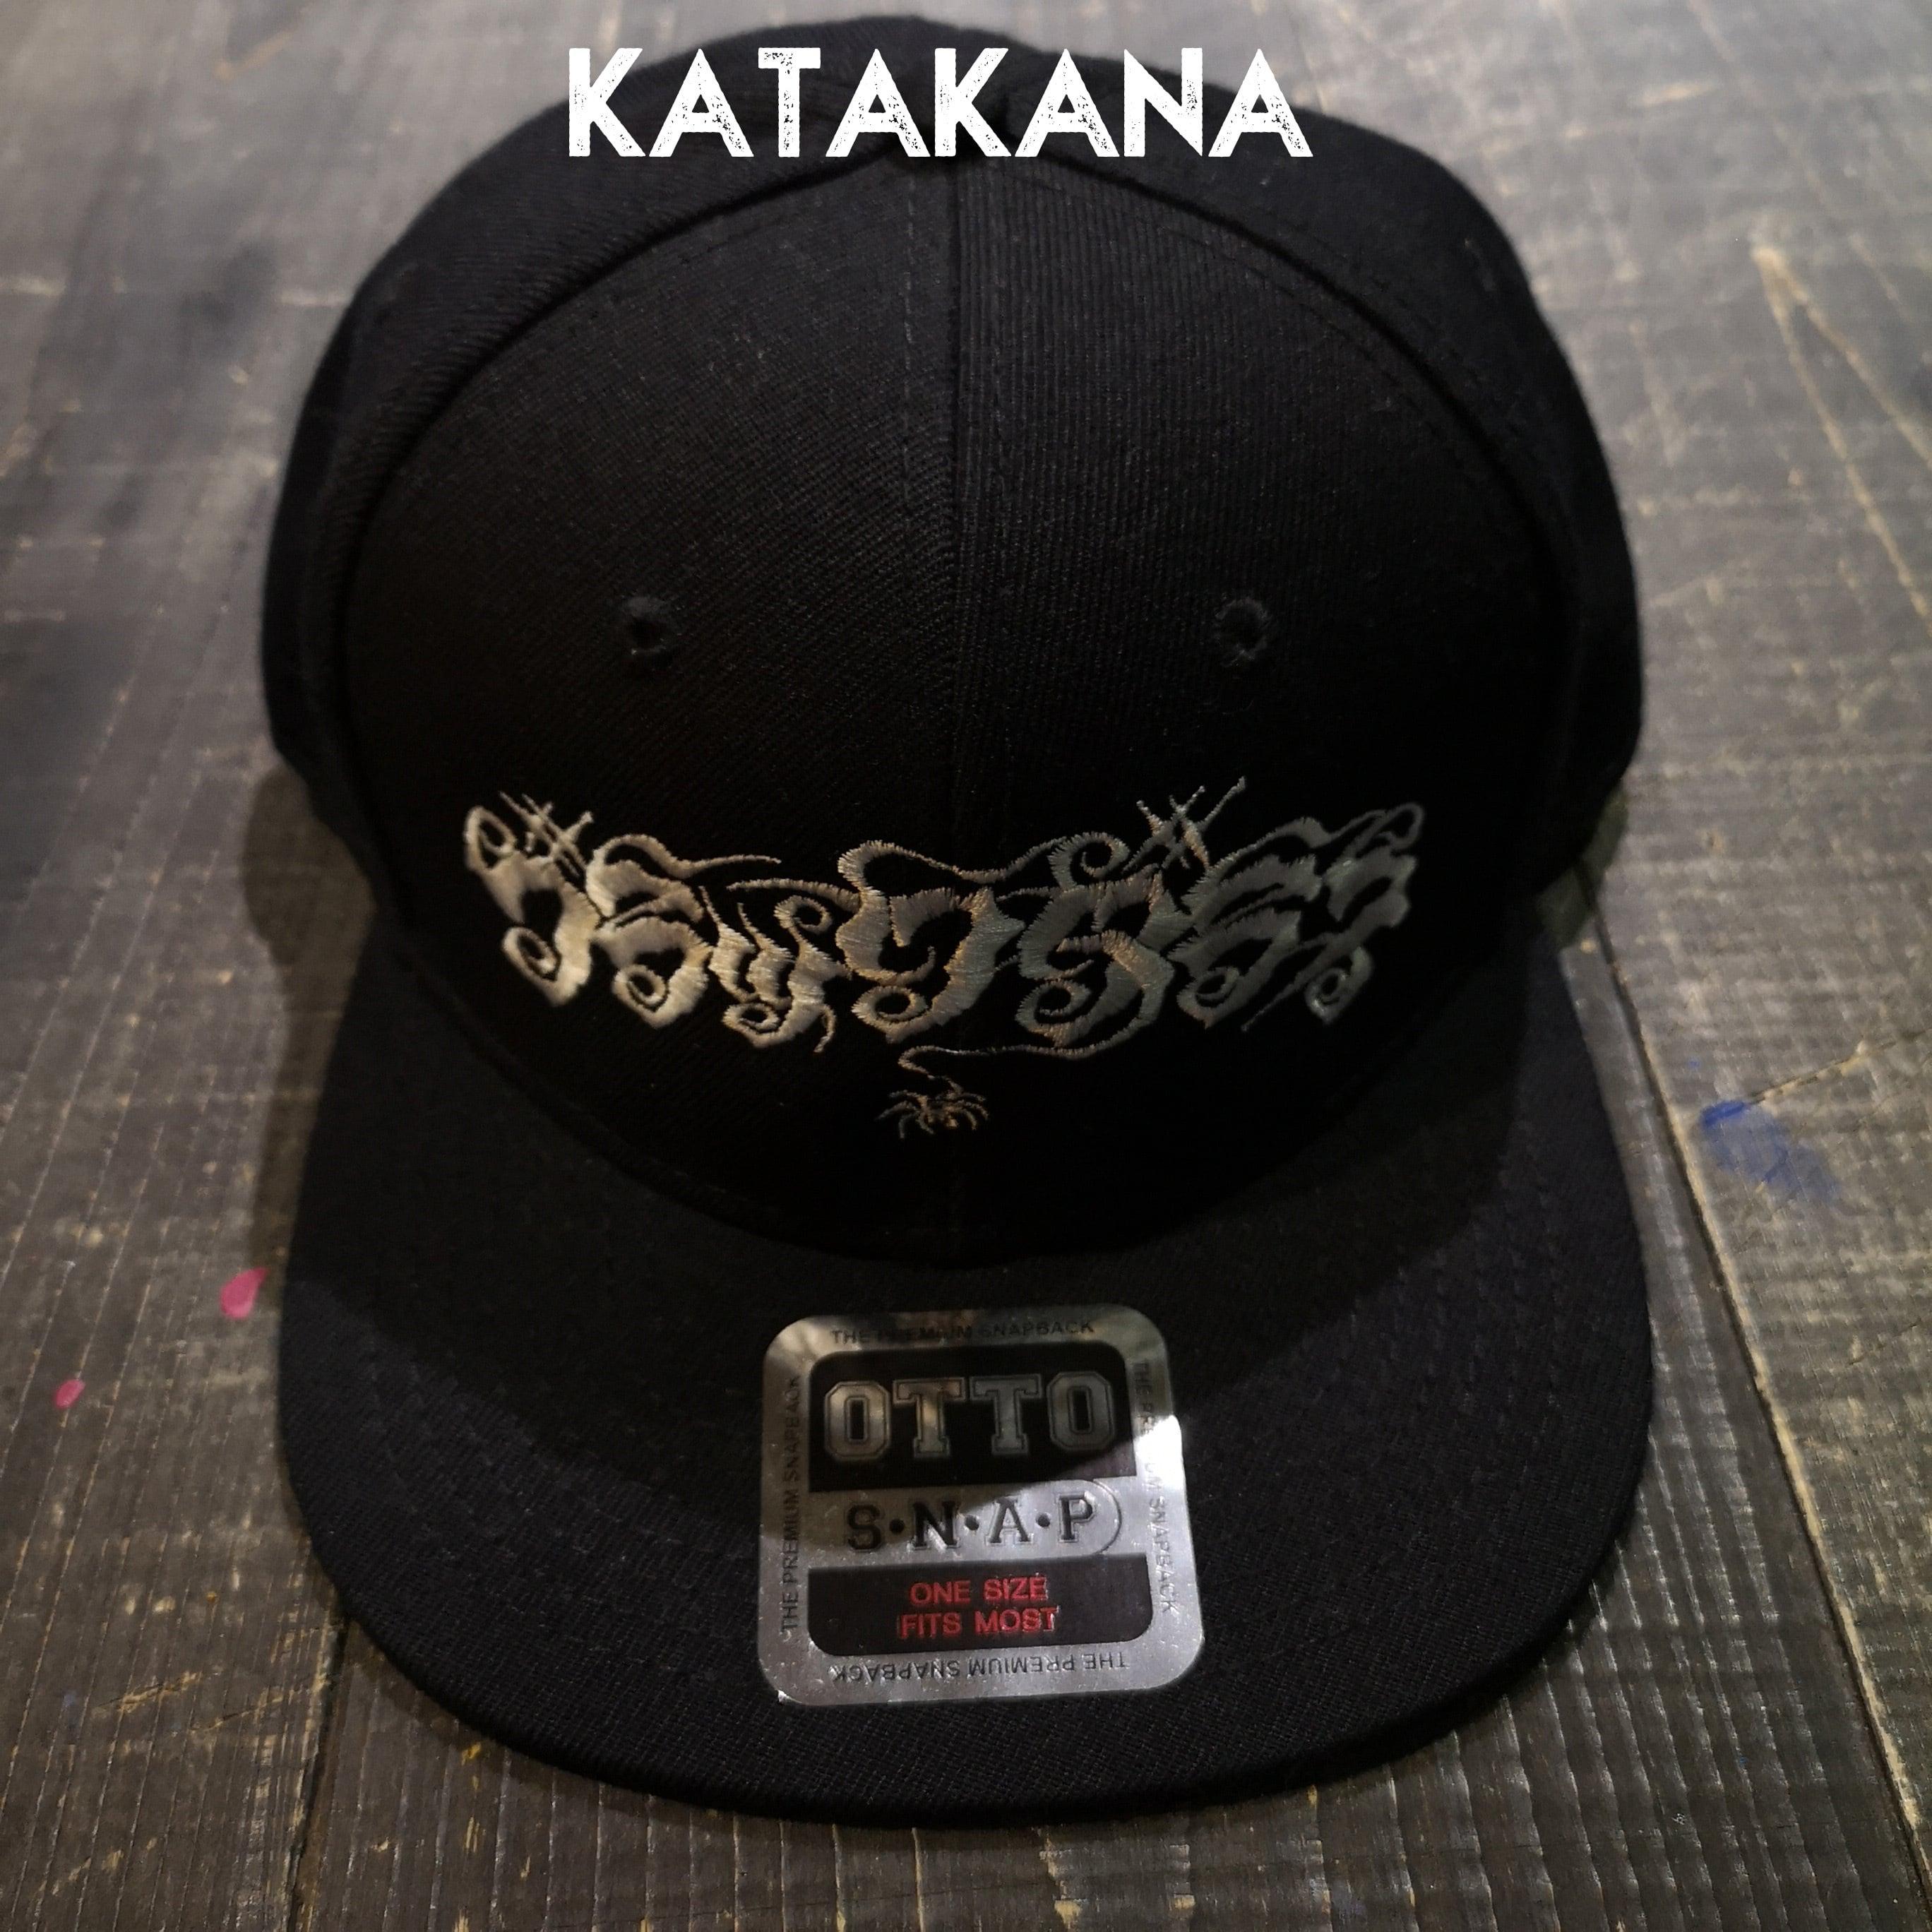 BLACK DALLAS SNAP BACK CAP/BLK Artwork by USUGROW